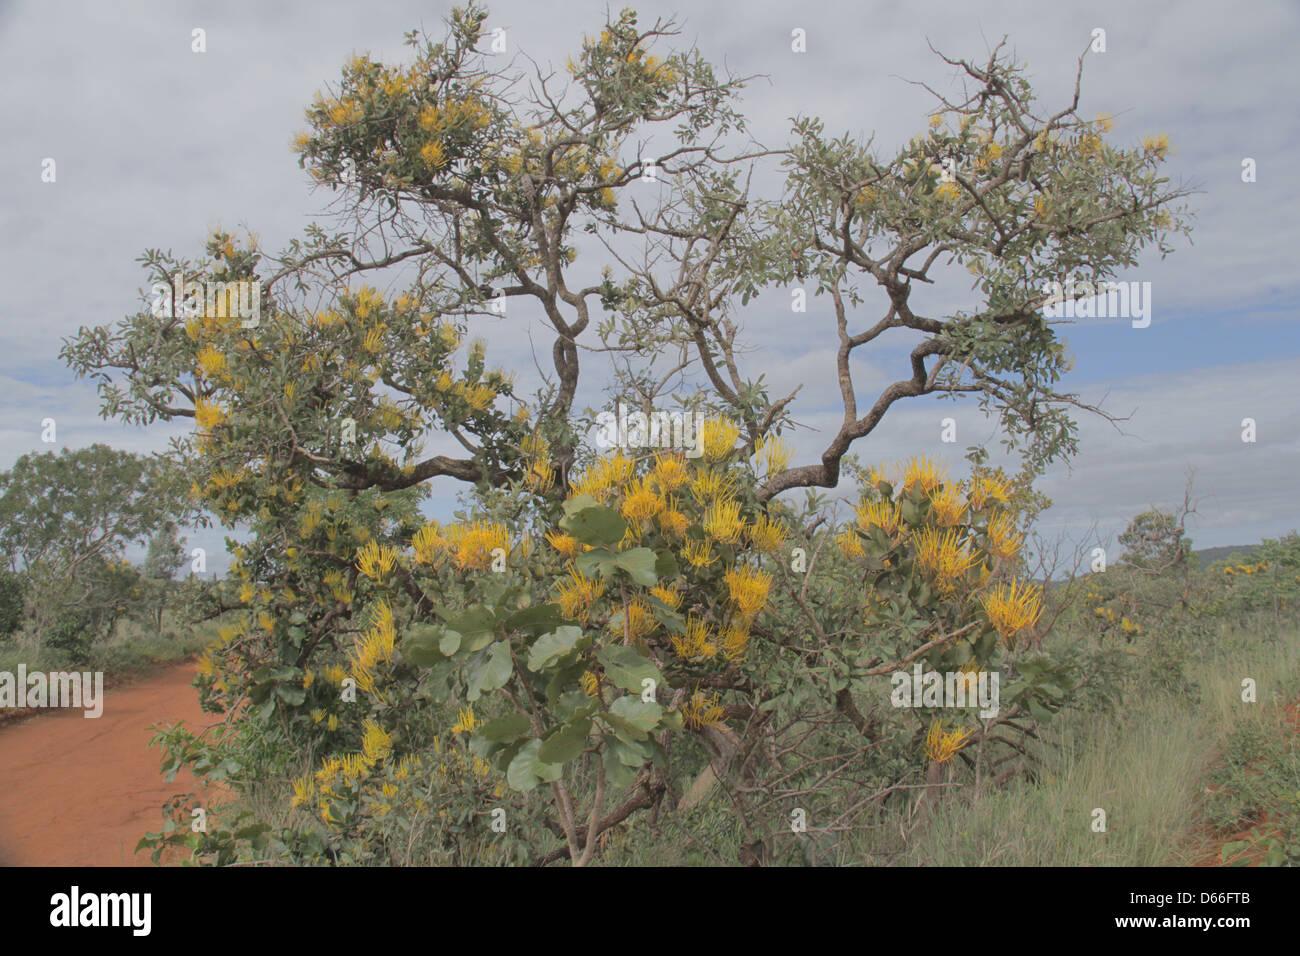 Mountain Cerrado vegetation flowers at Chapada dos Veadeiros  Central Brazil - Stock Image